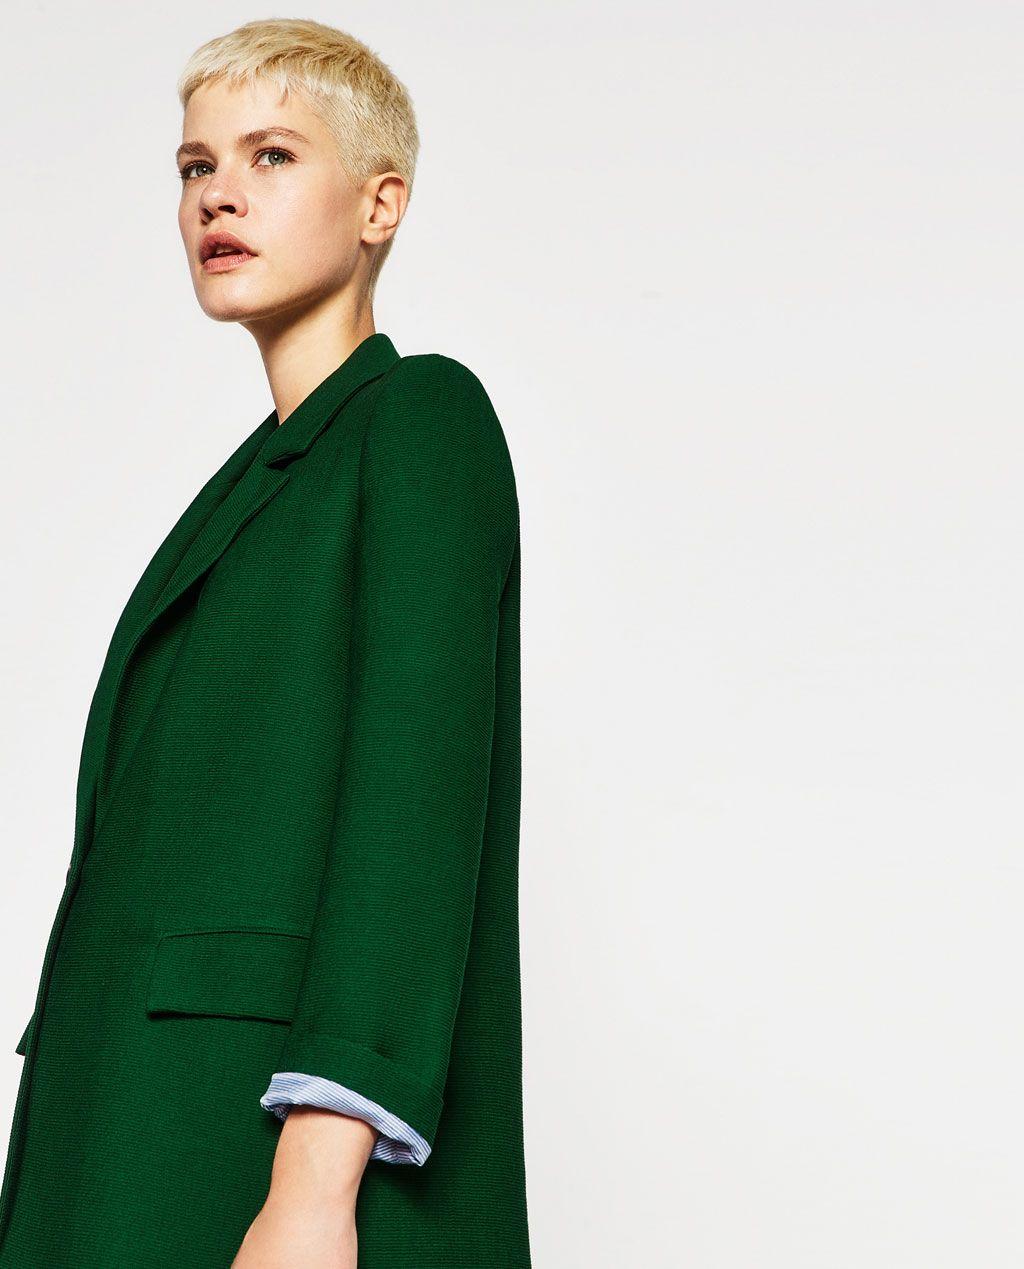 Shop Zara Coat Thrift Coat Masculine From Pinterest w7Ipxf1qw8